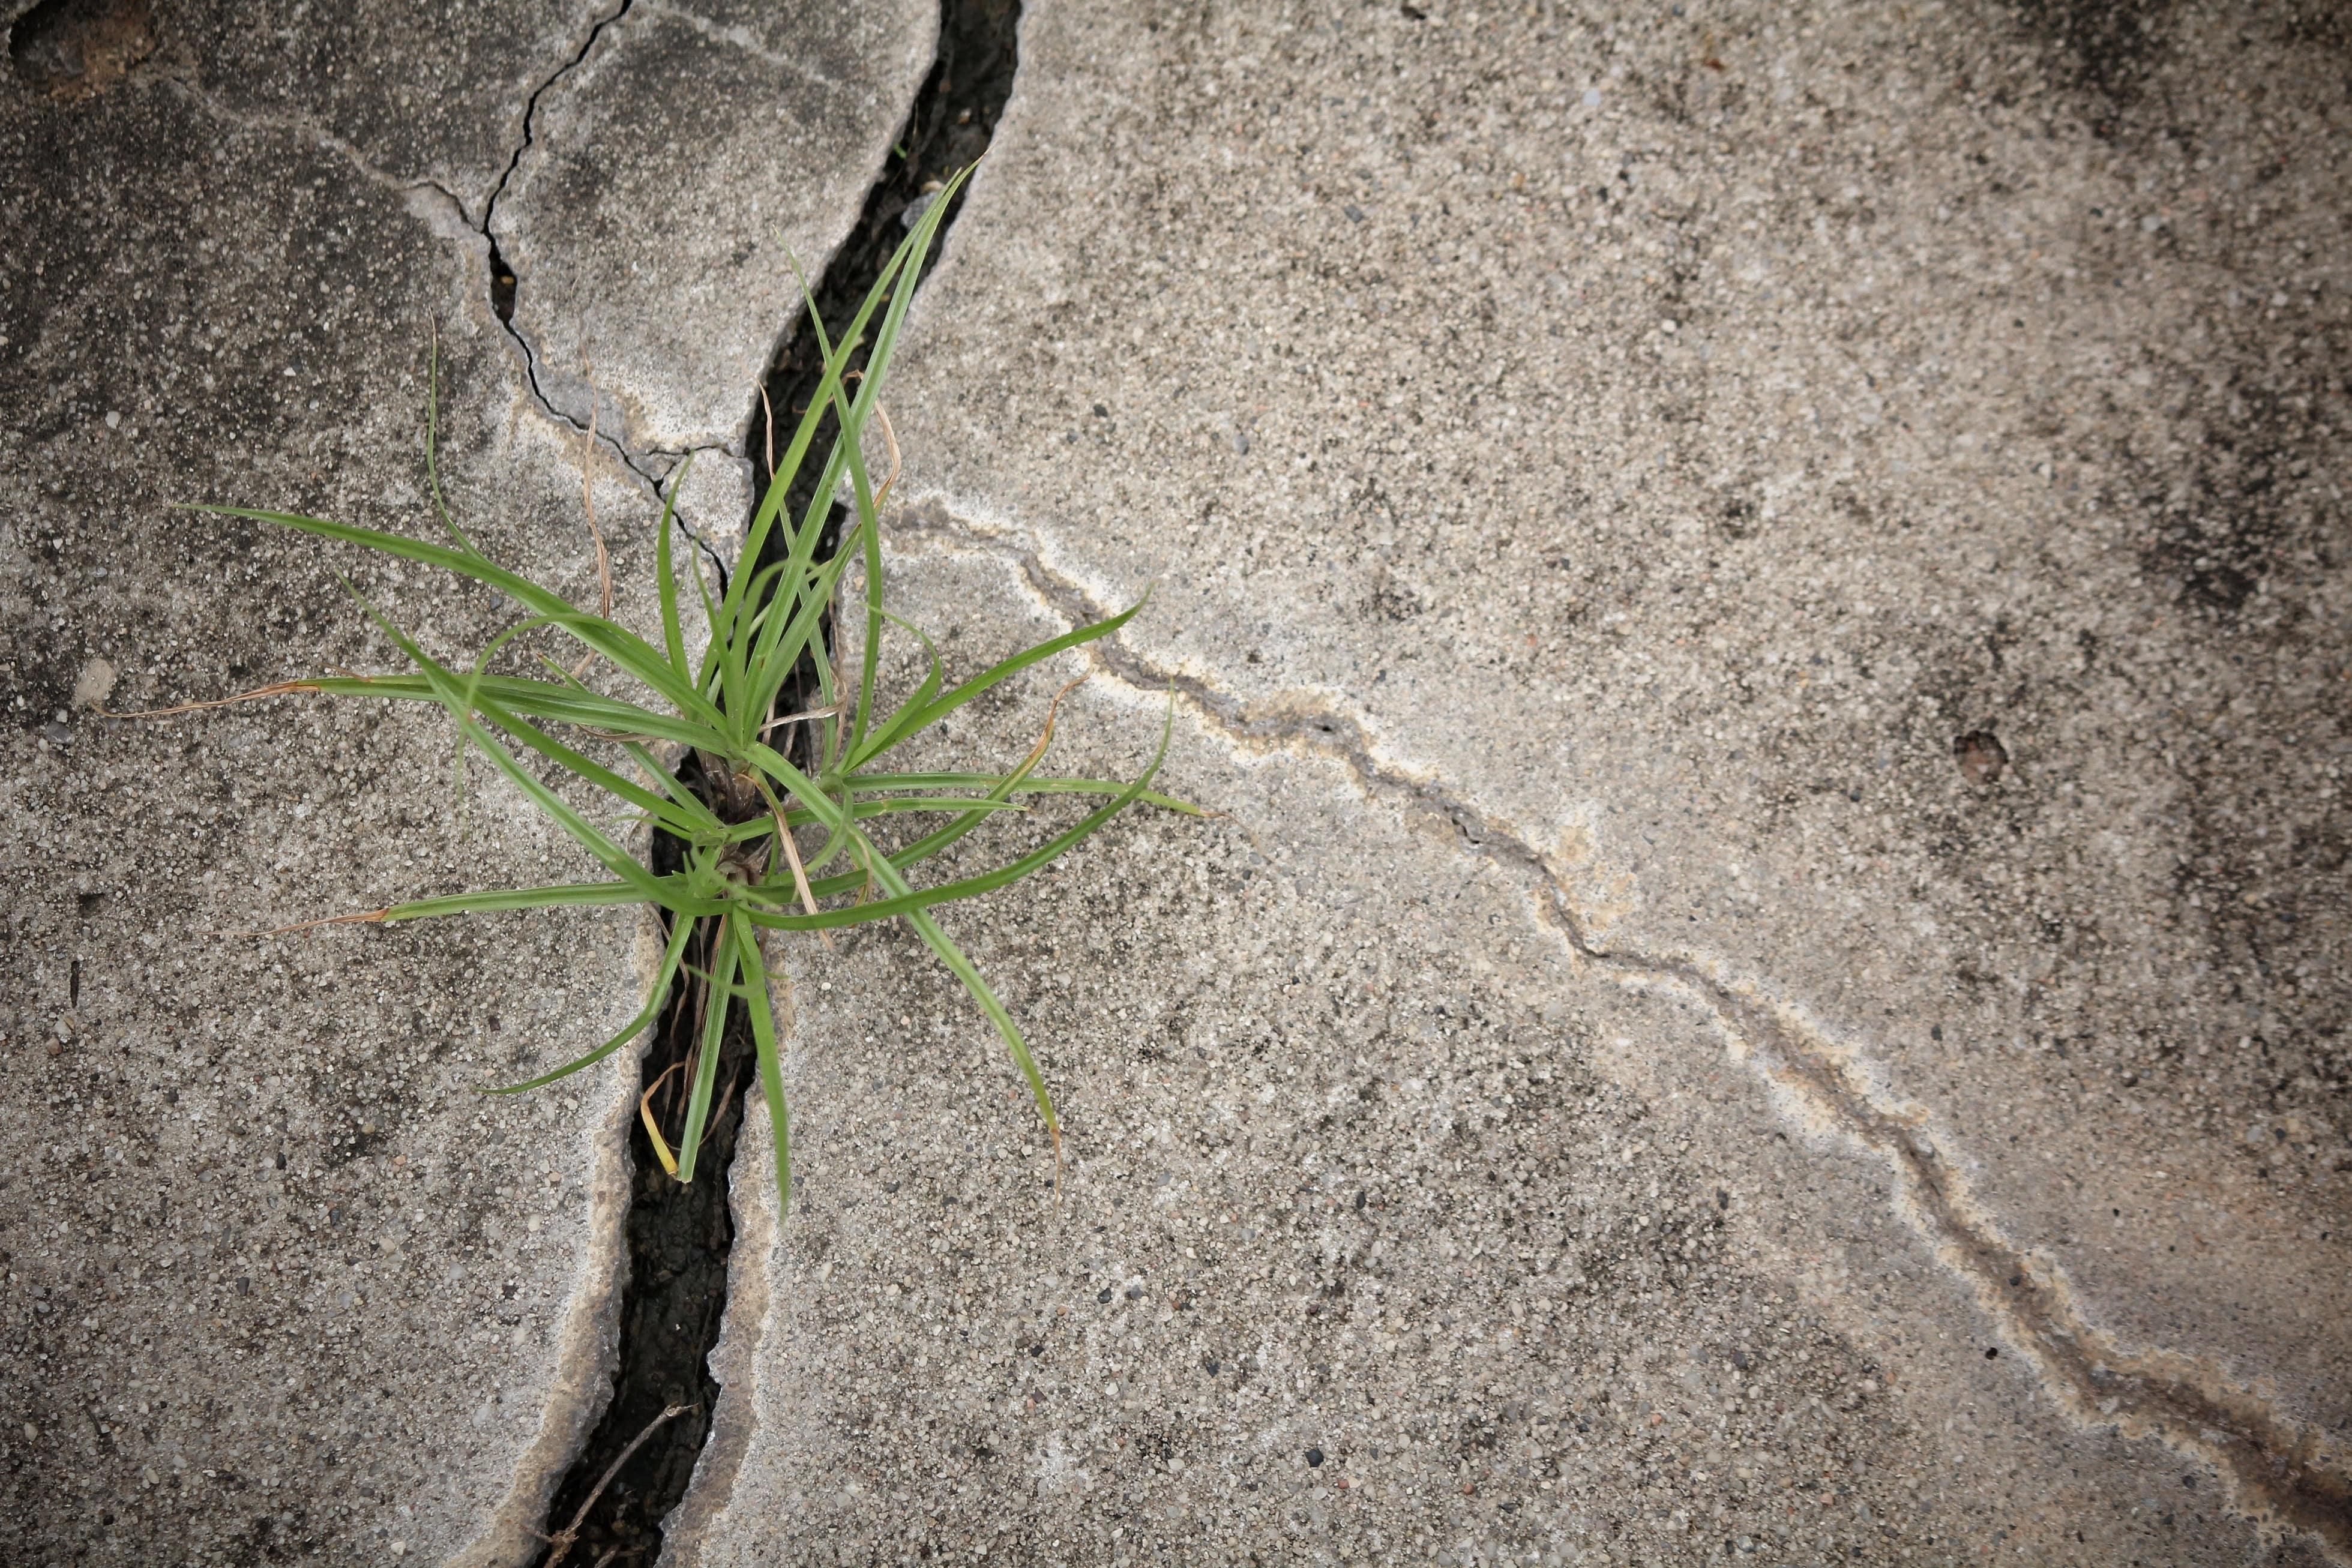 Driveway Crack, Crack, Cement Crack